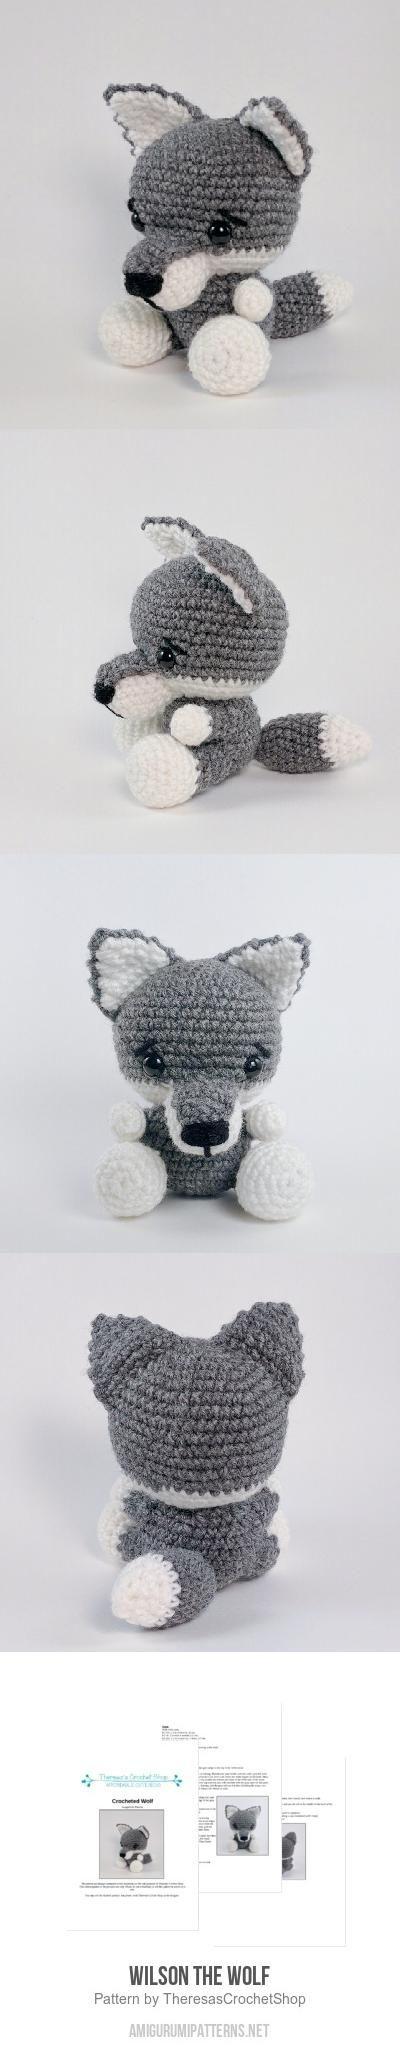 Crochet wolf amigurumi pattern - Amigurumi Today | 2052x400